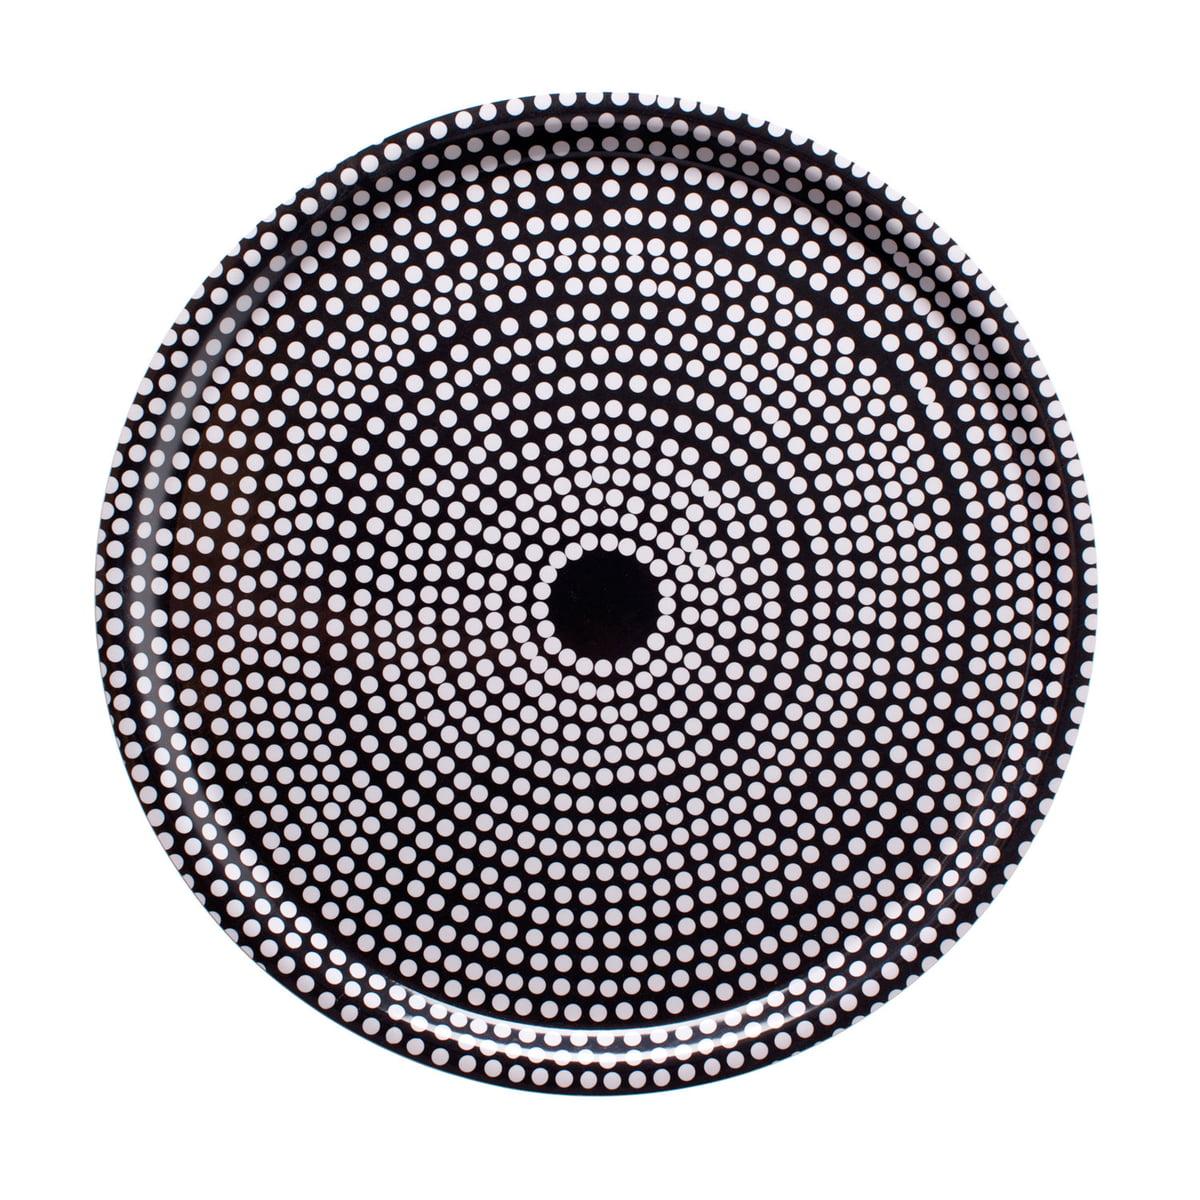 Fokus Tablett rund Ø 46 cm